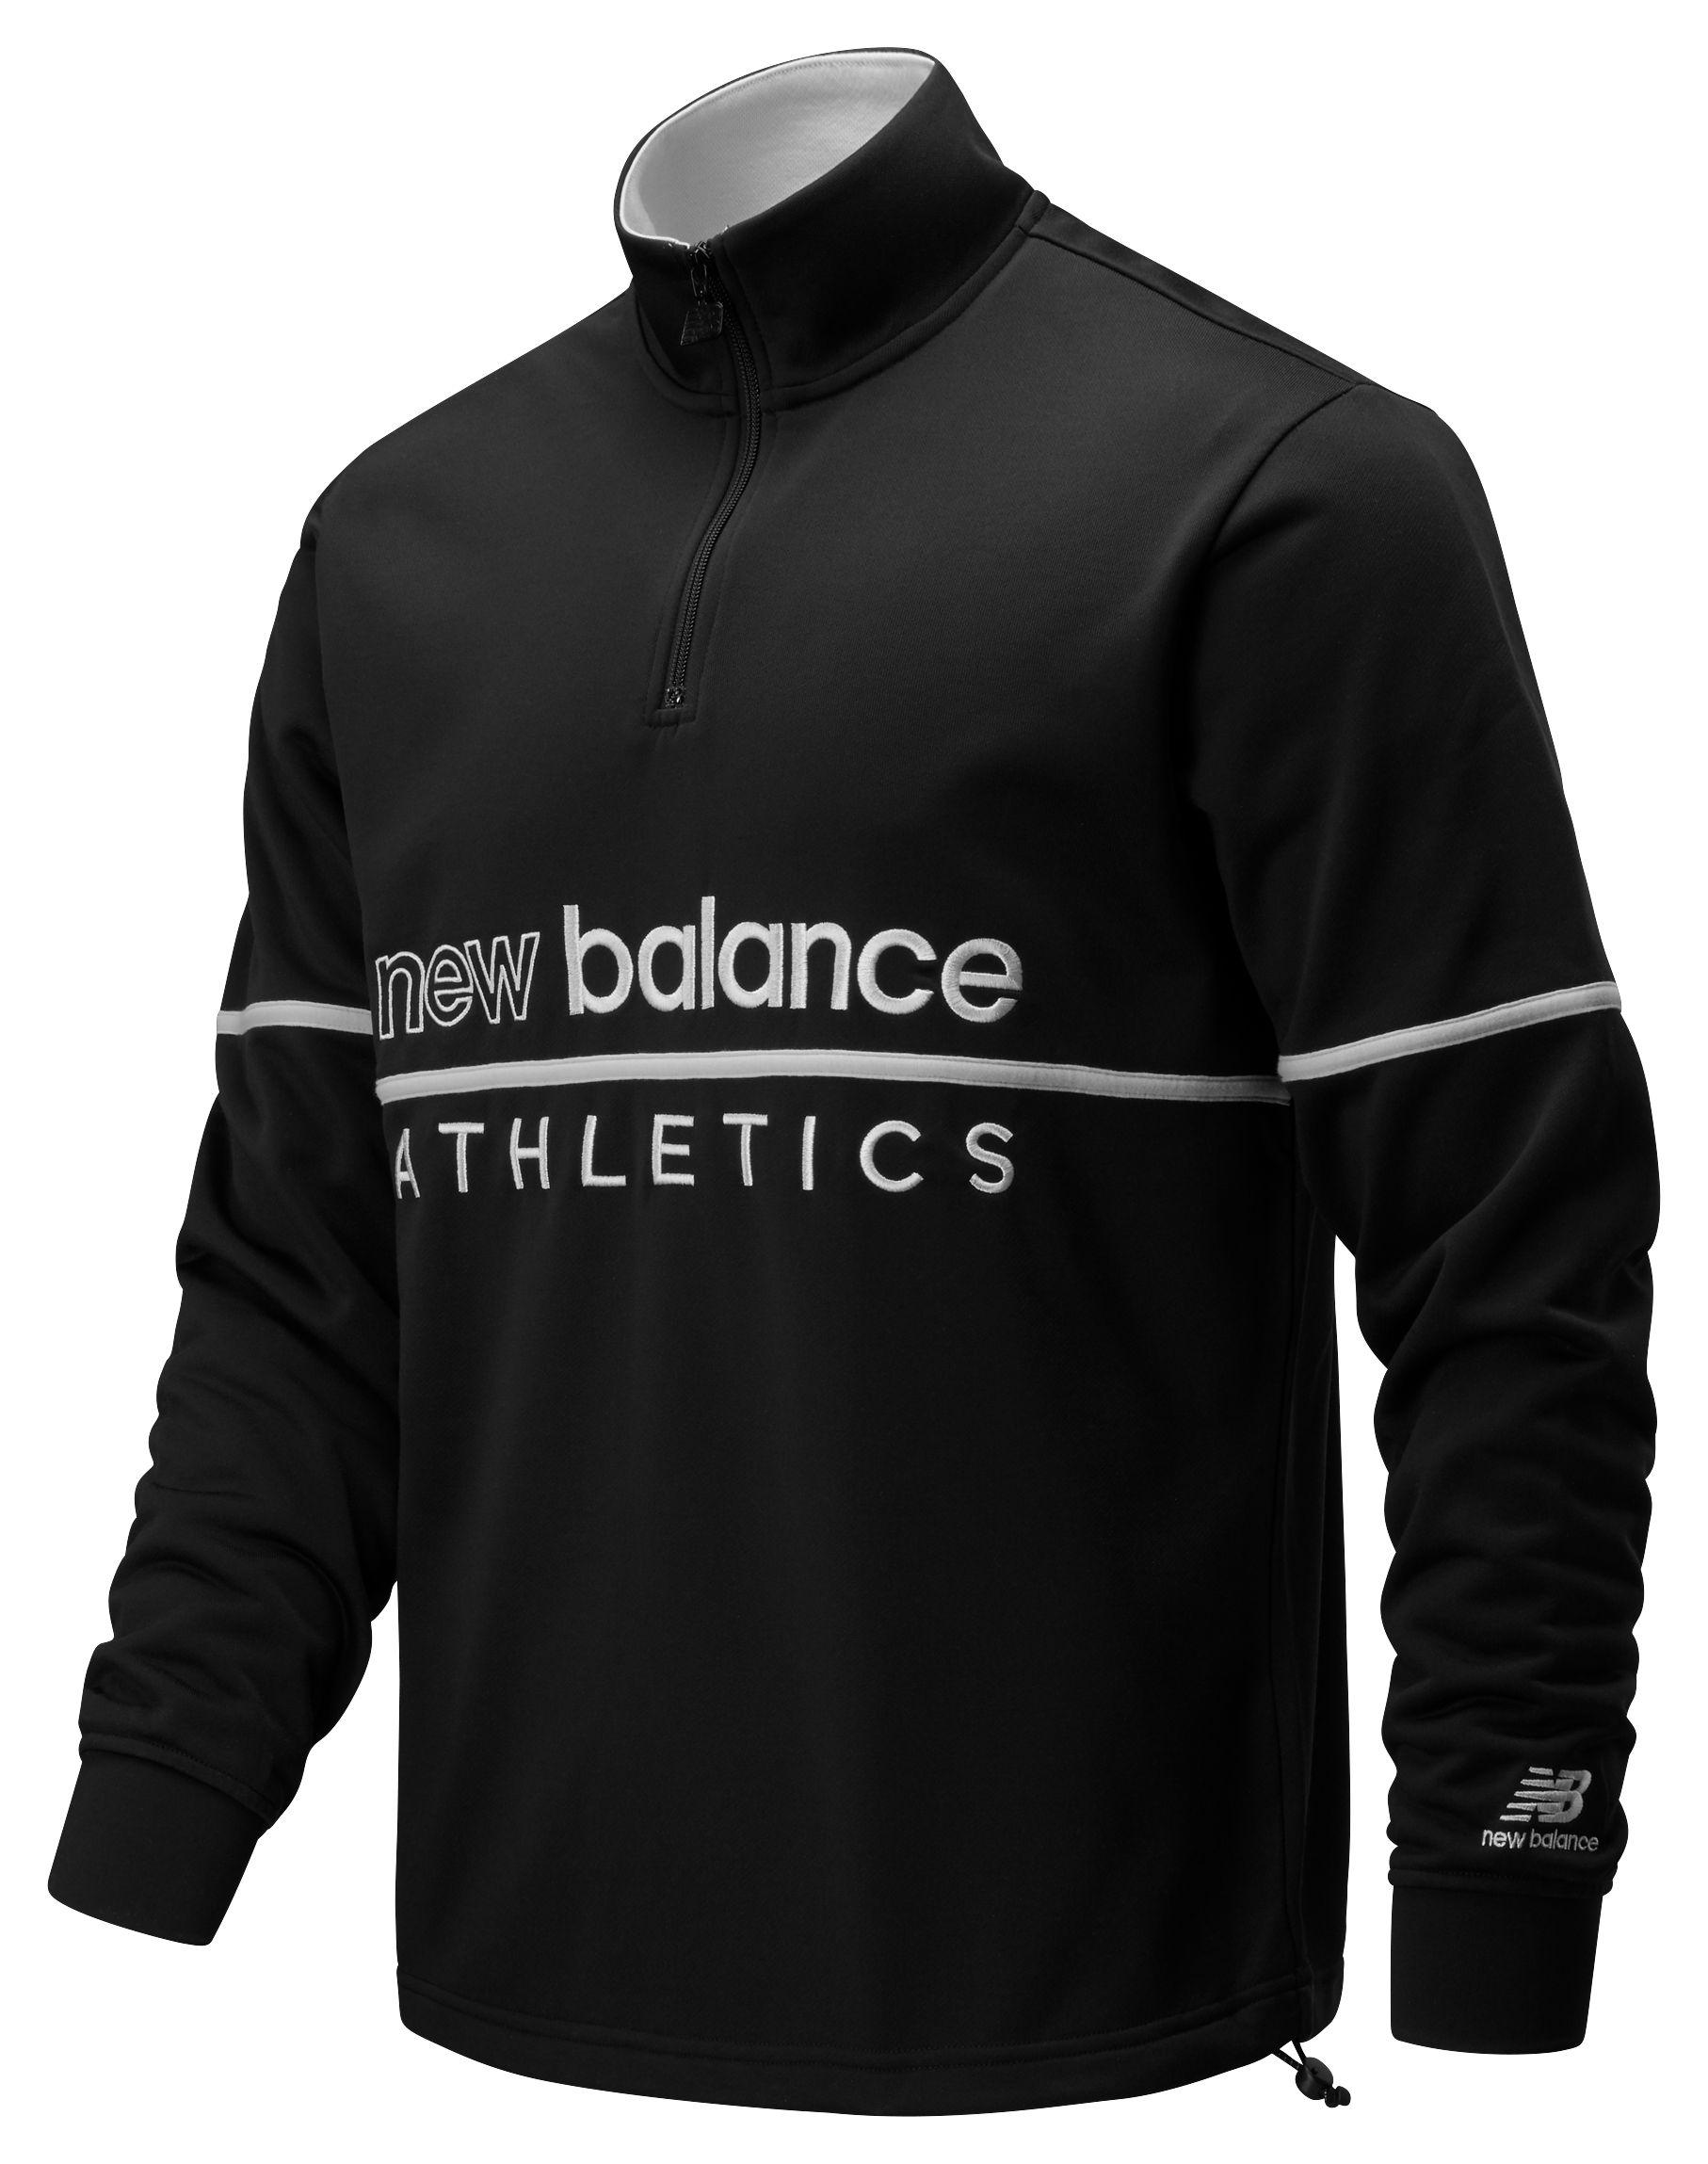 New Balance NB Athletics Track 1/4 Zip Men's Top   eBay